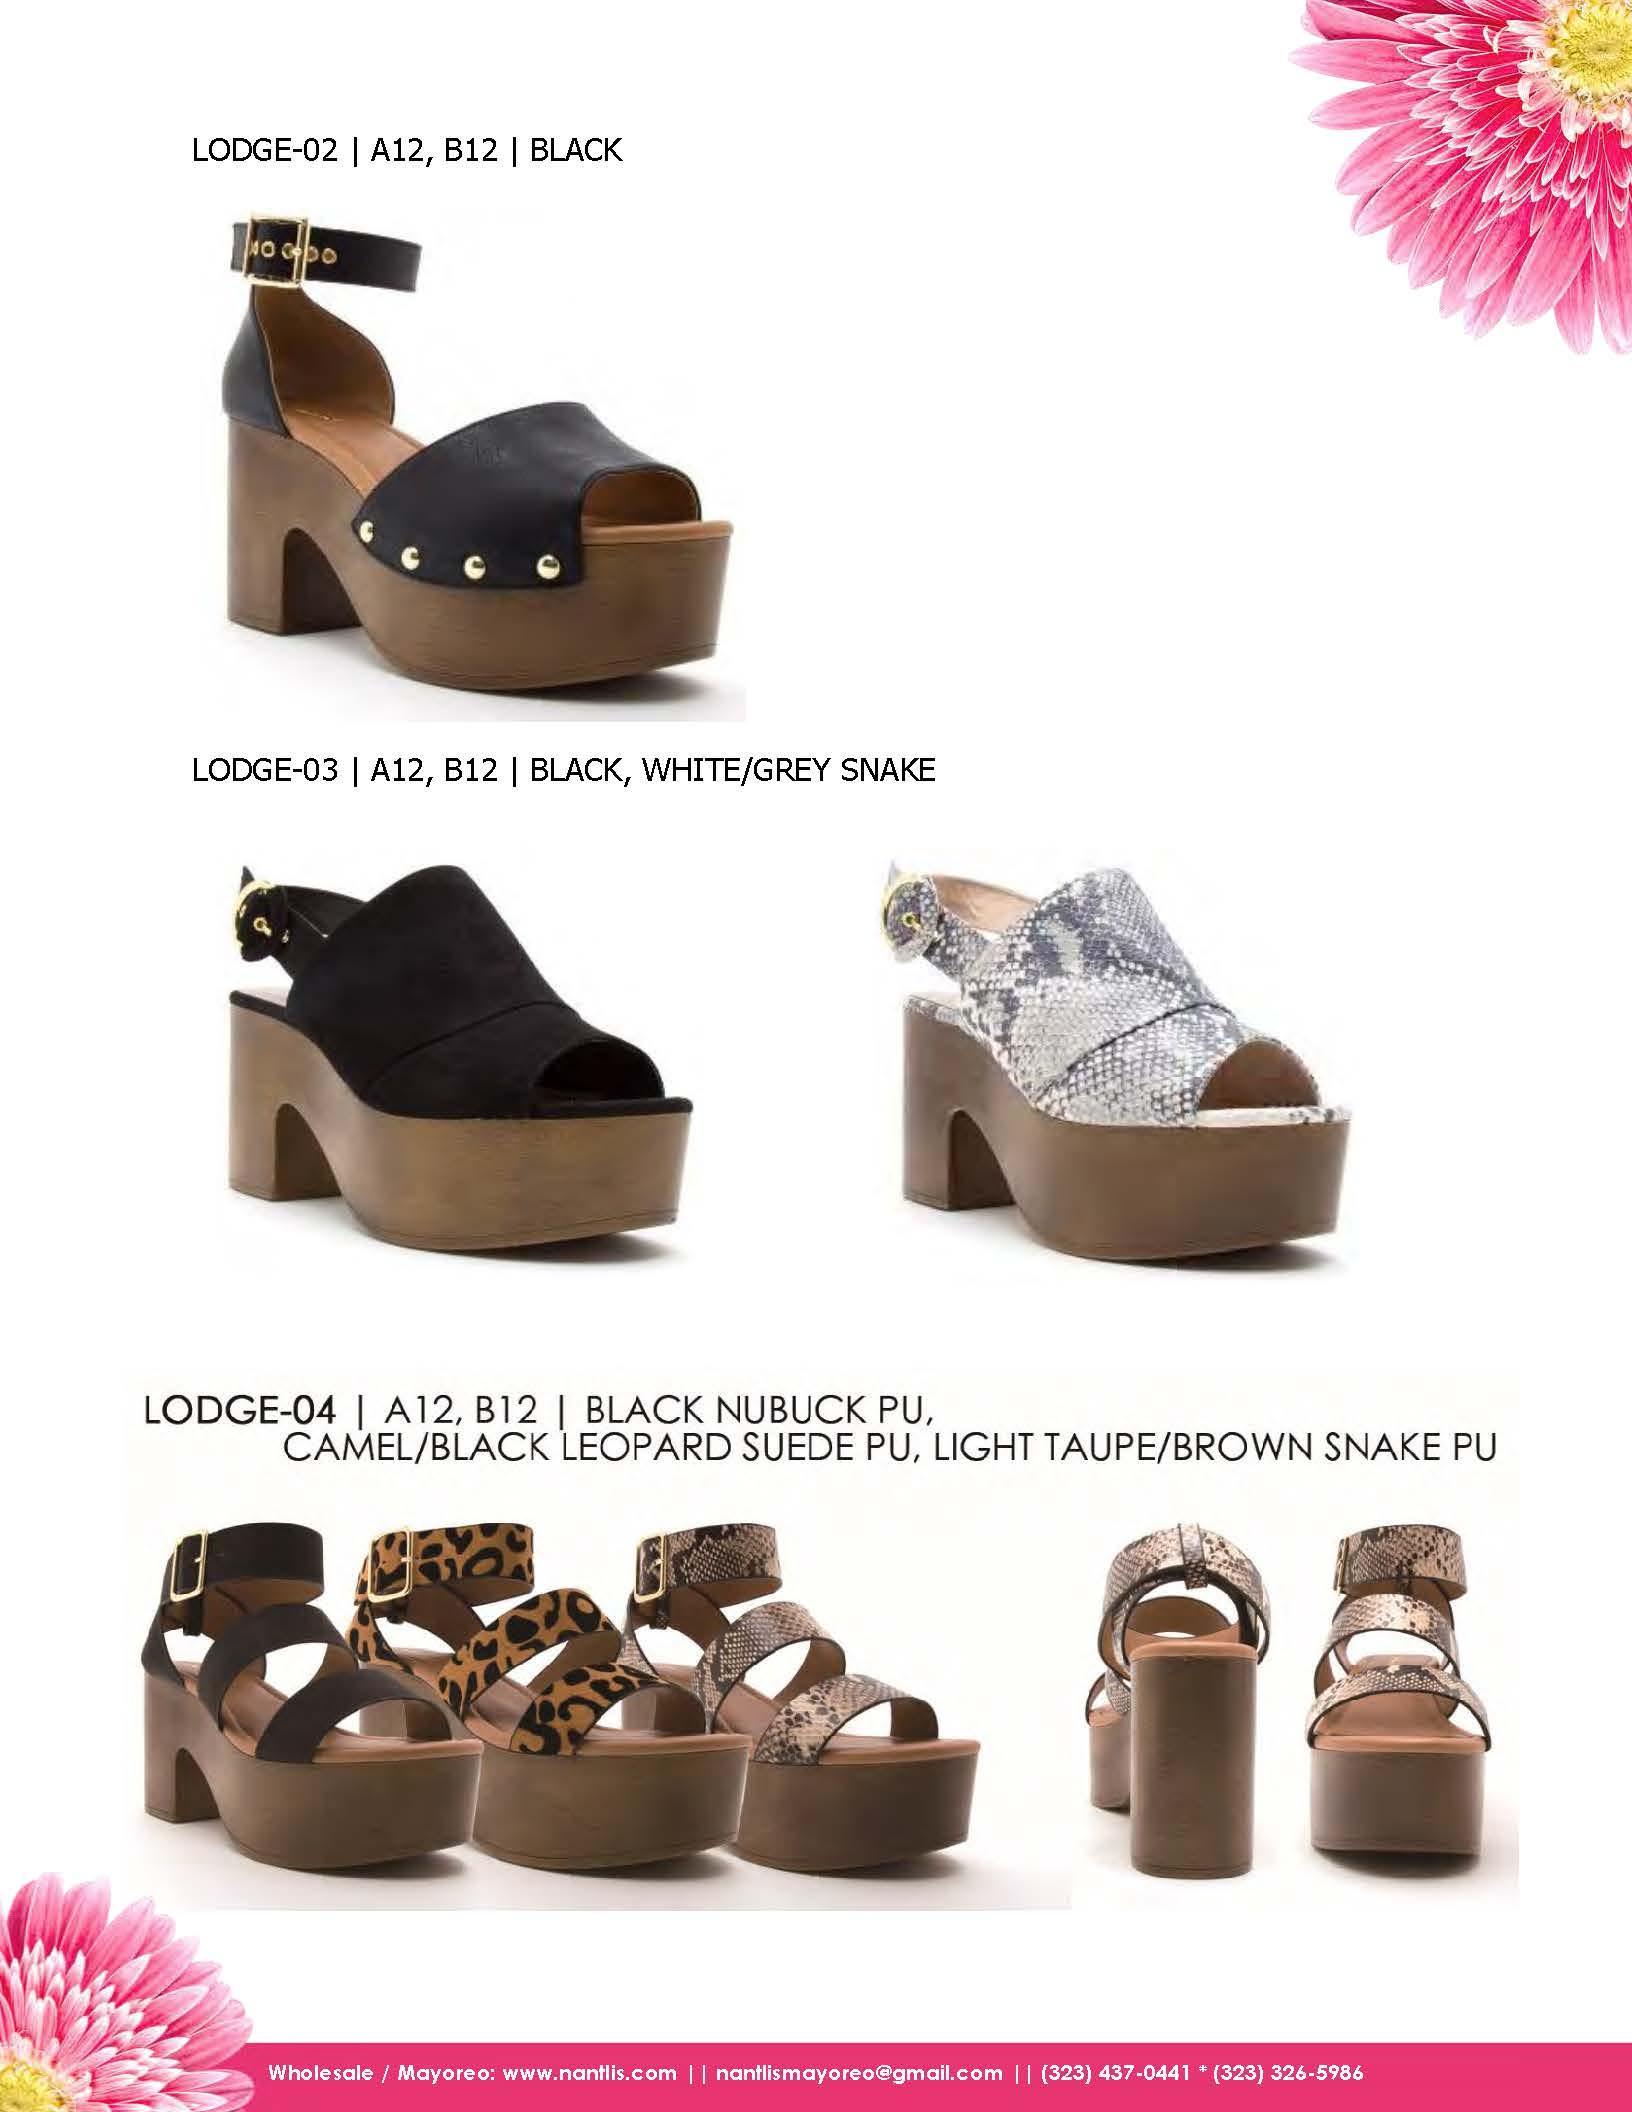 Nantlis Vol QU43 Zapatos para mujer mayoreo Wholesale shoes for women_Page_25